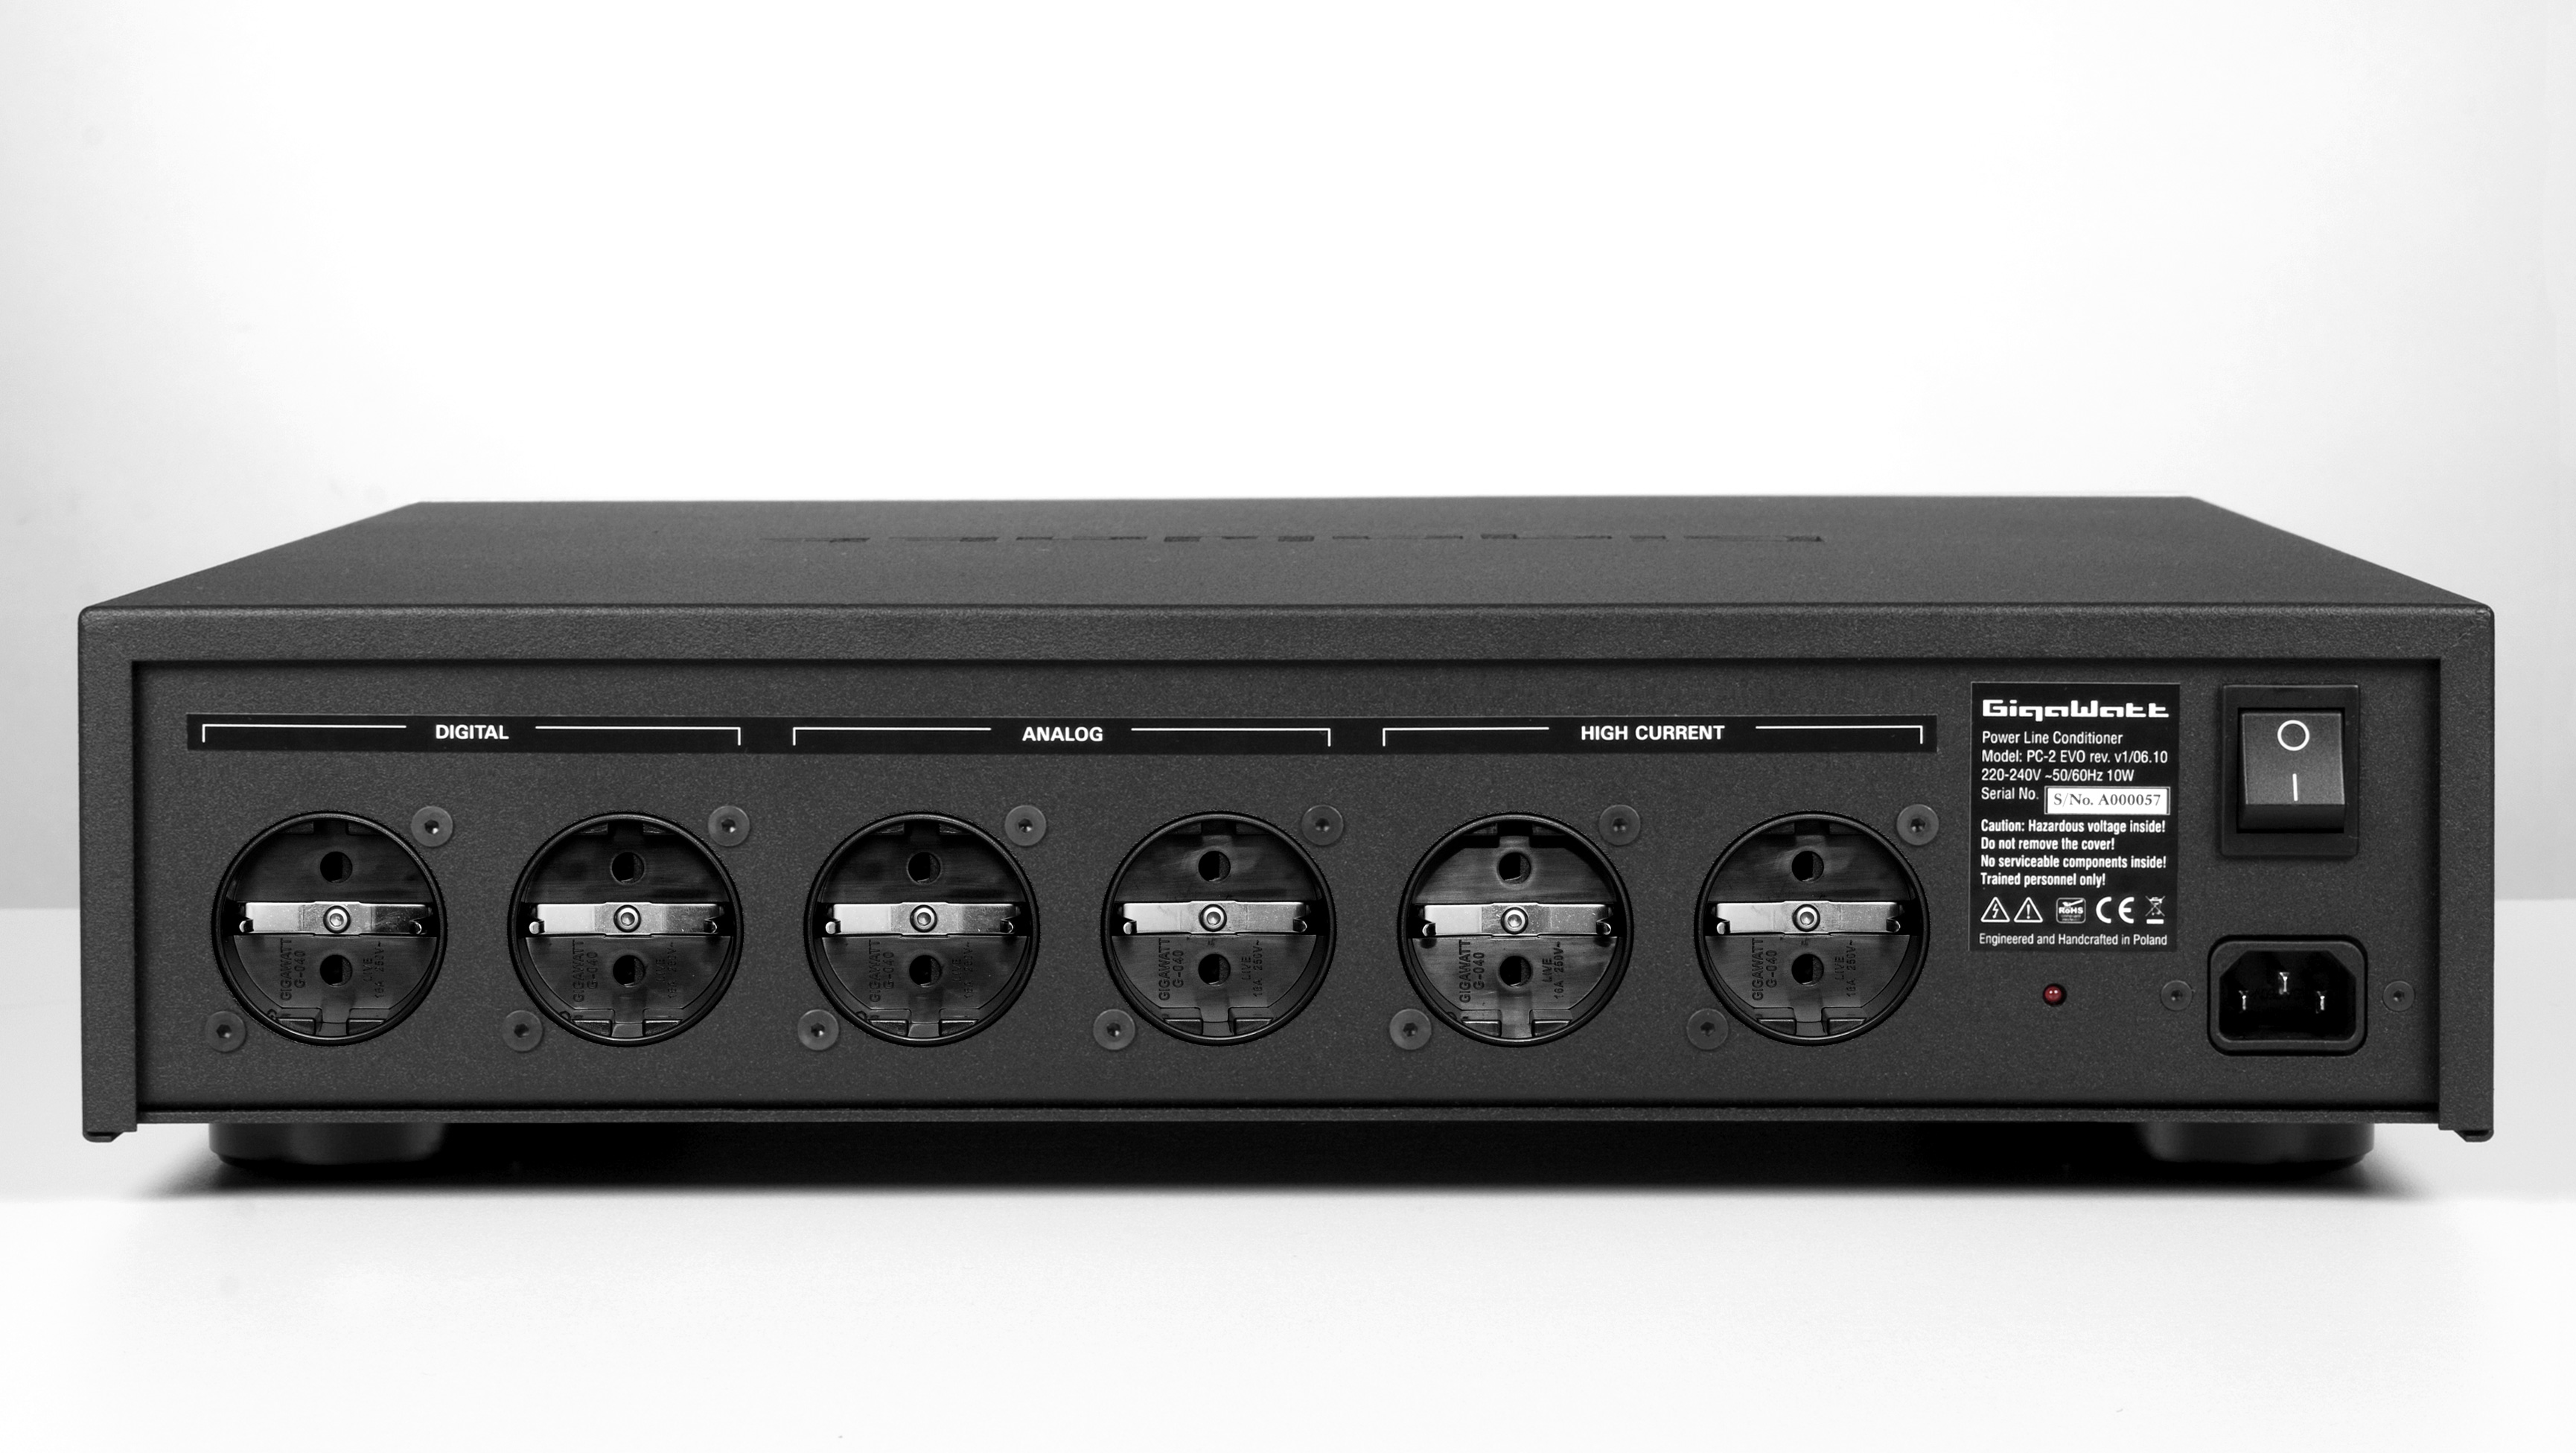 Power Line Conditioner GigaWatt PC-2 EVO+ – GigaWatt